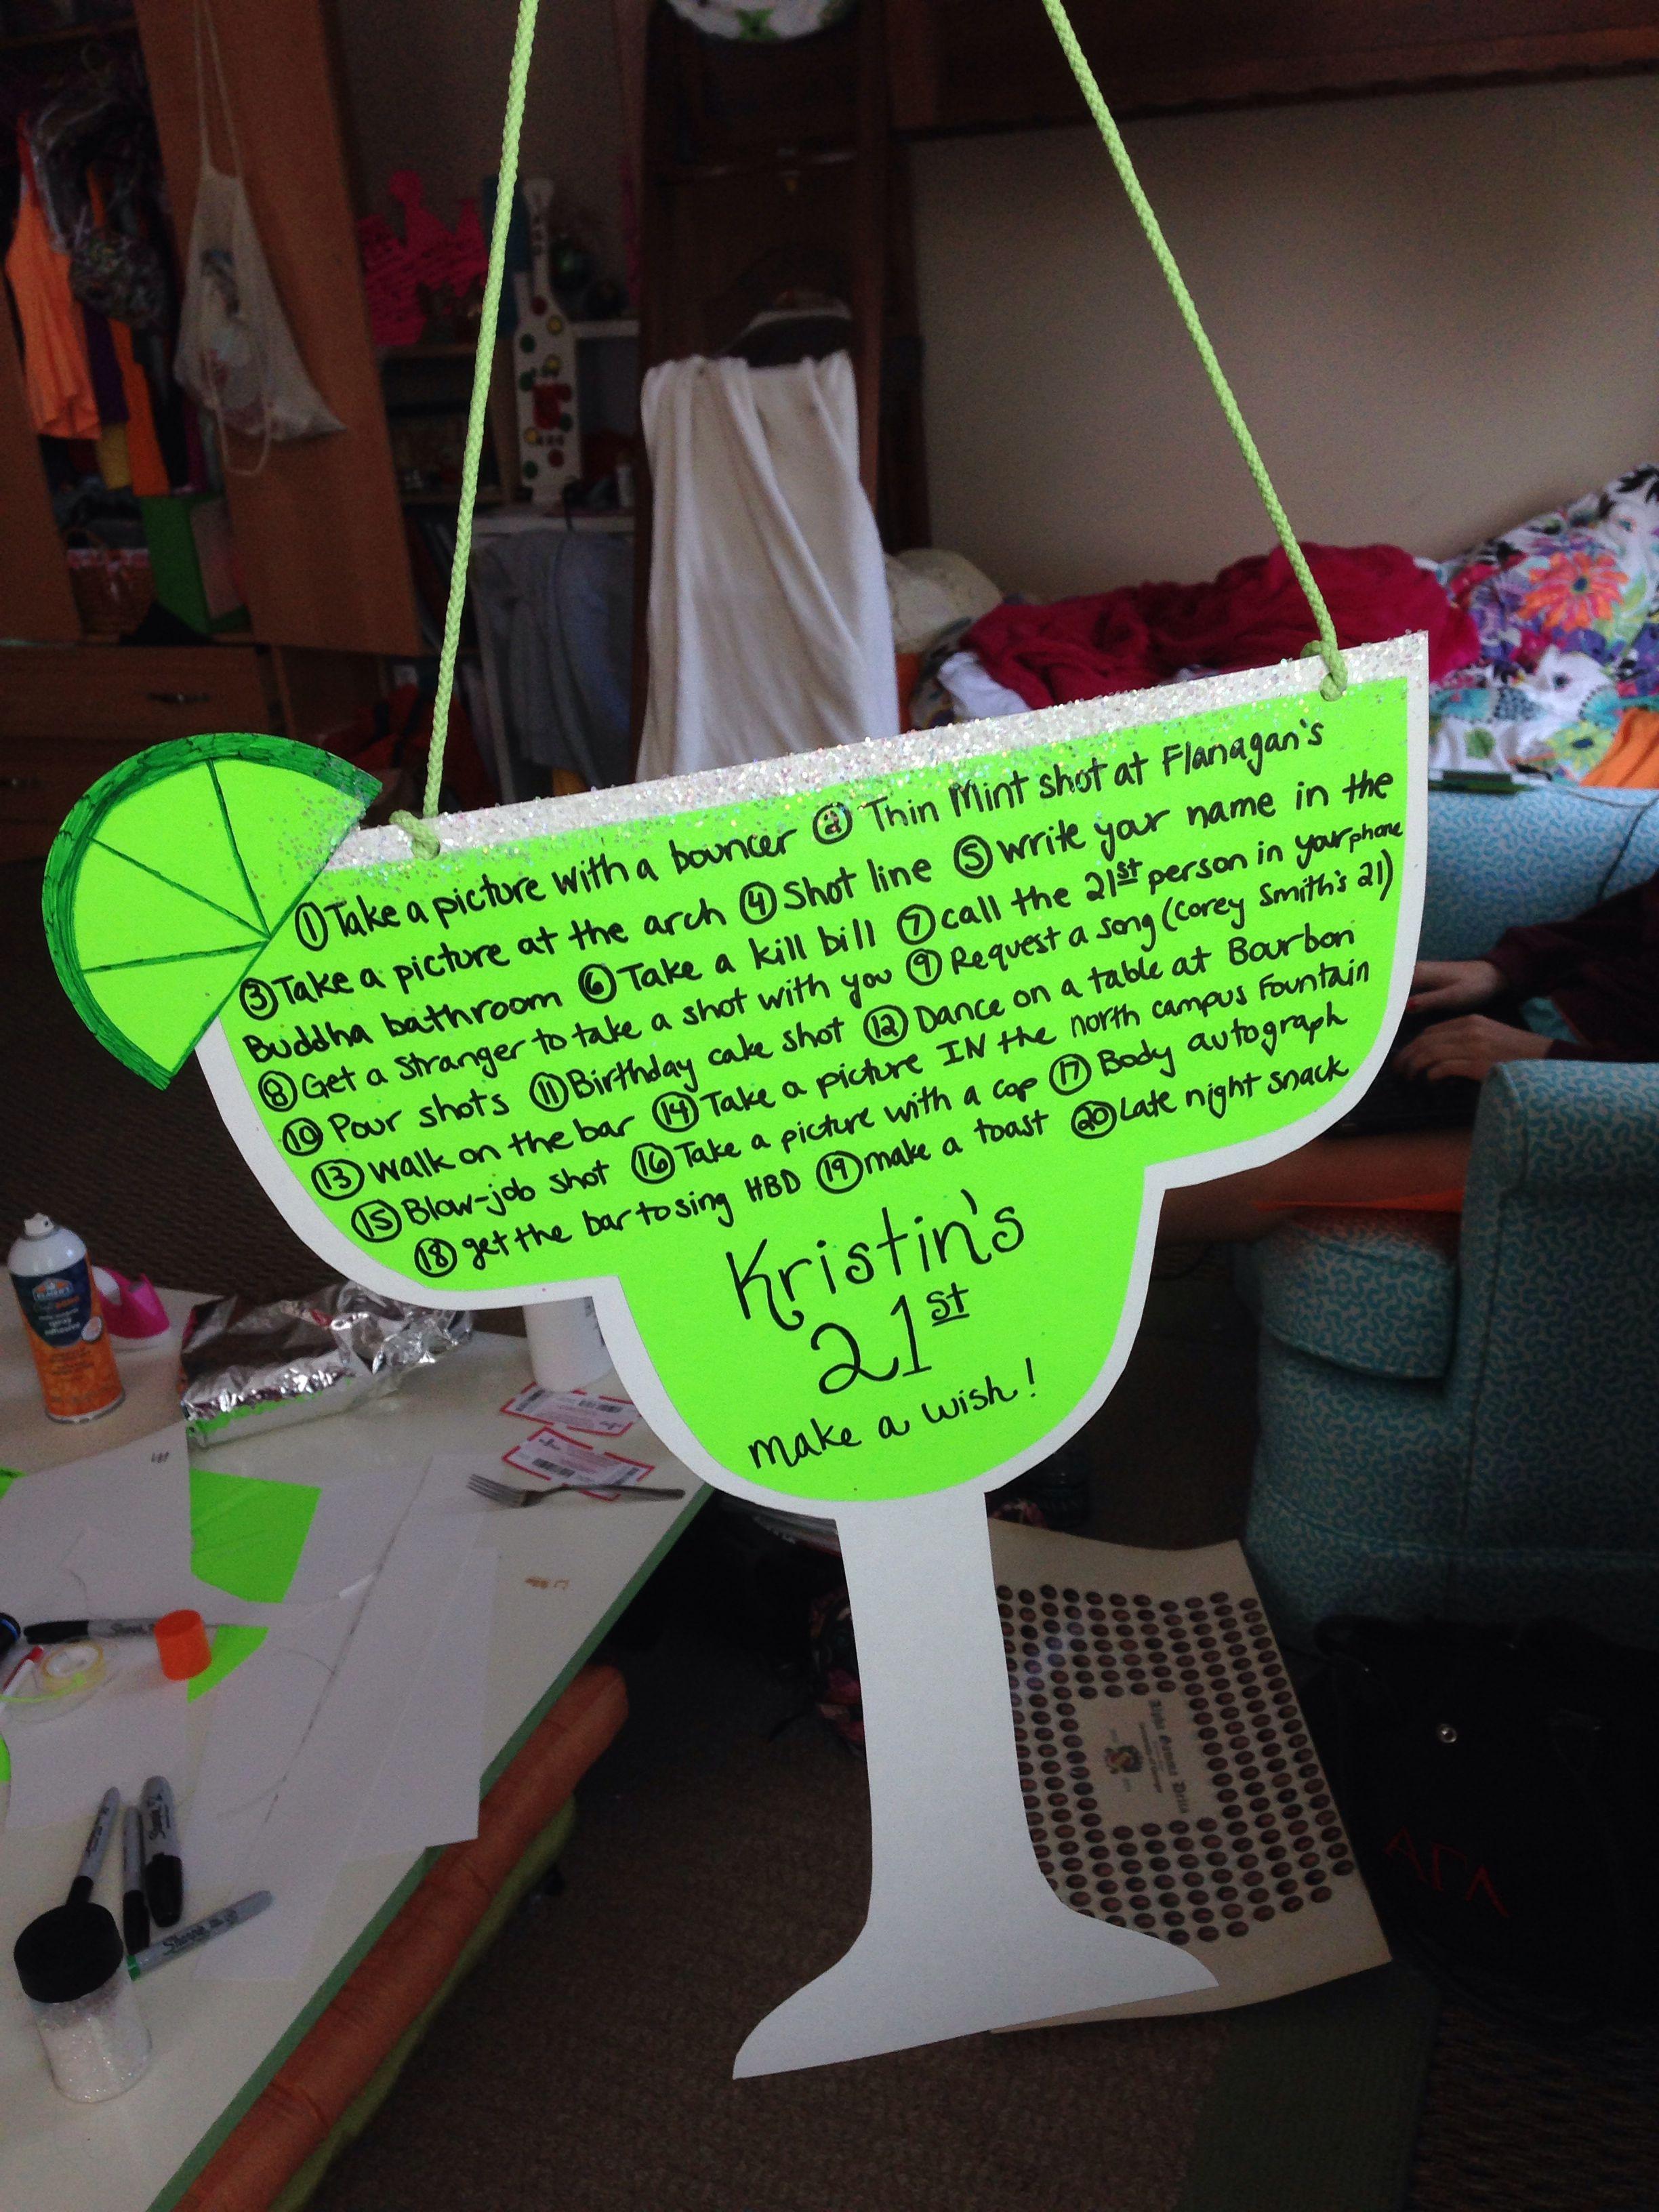 Kristin's 21st birthday sign! #21stbirthdaysigns Kristin's 21st birthday sign! #21stbirthdaysigns